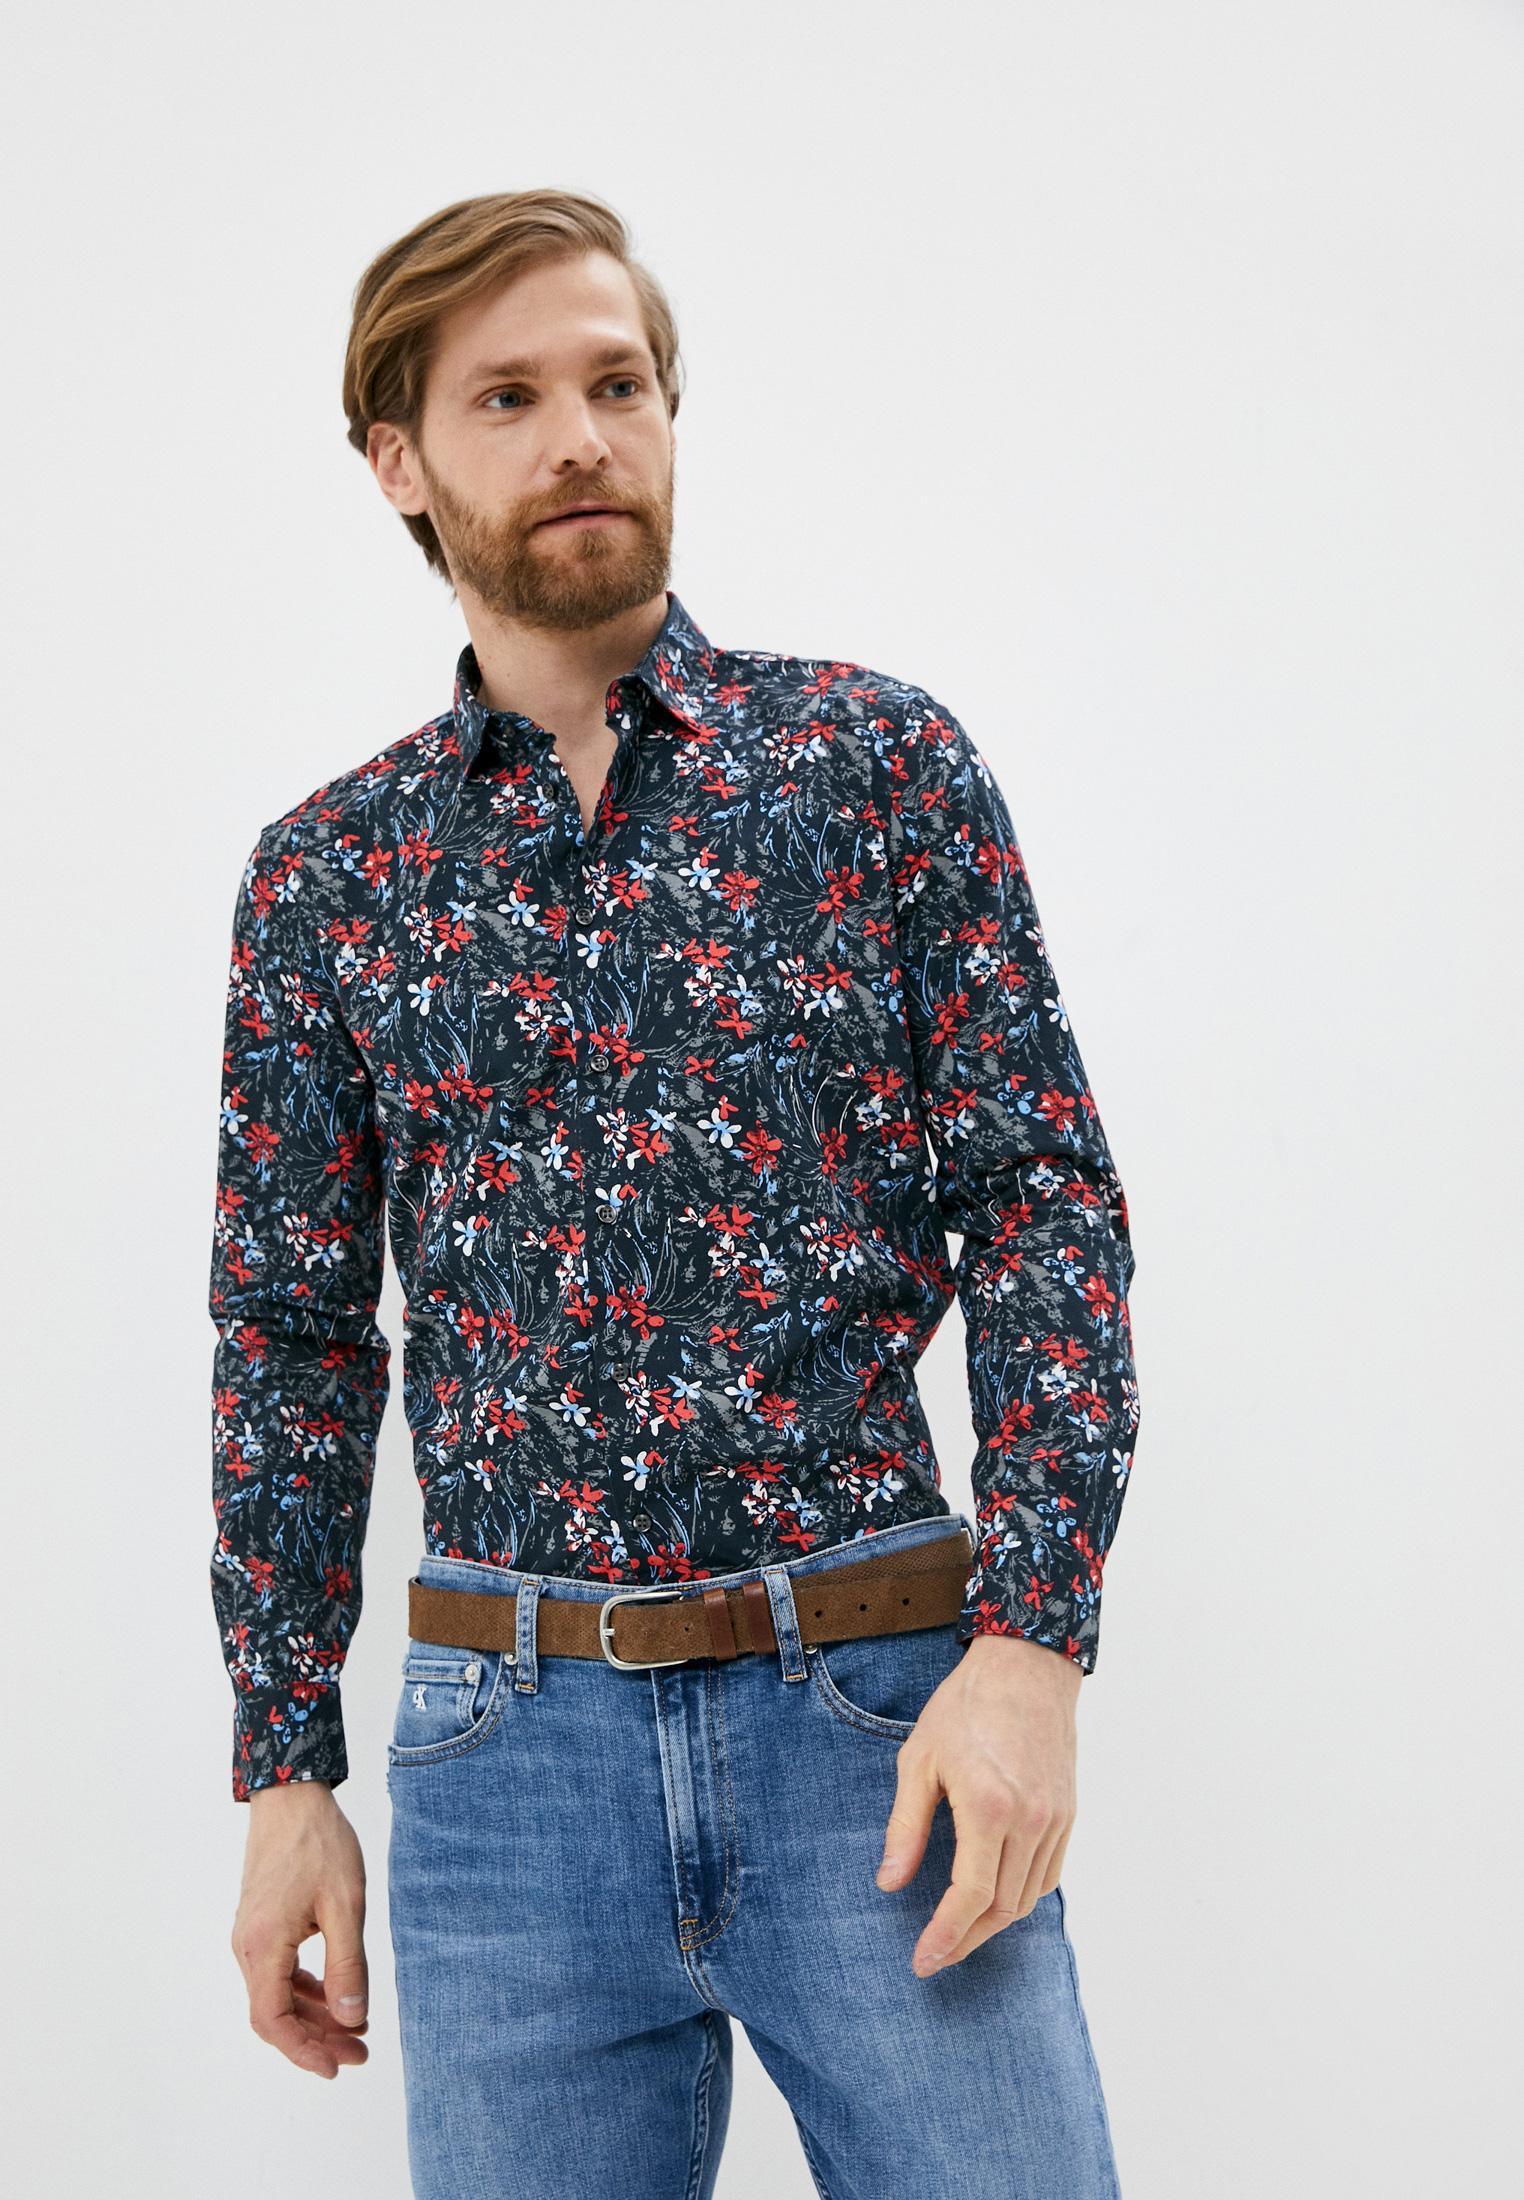 Рубашка с длинным рукавом Sisley (Сислей) Рубашка Sisley